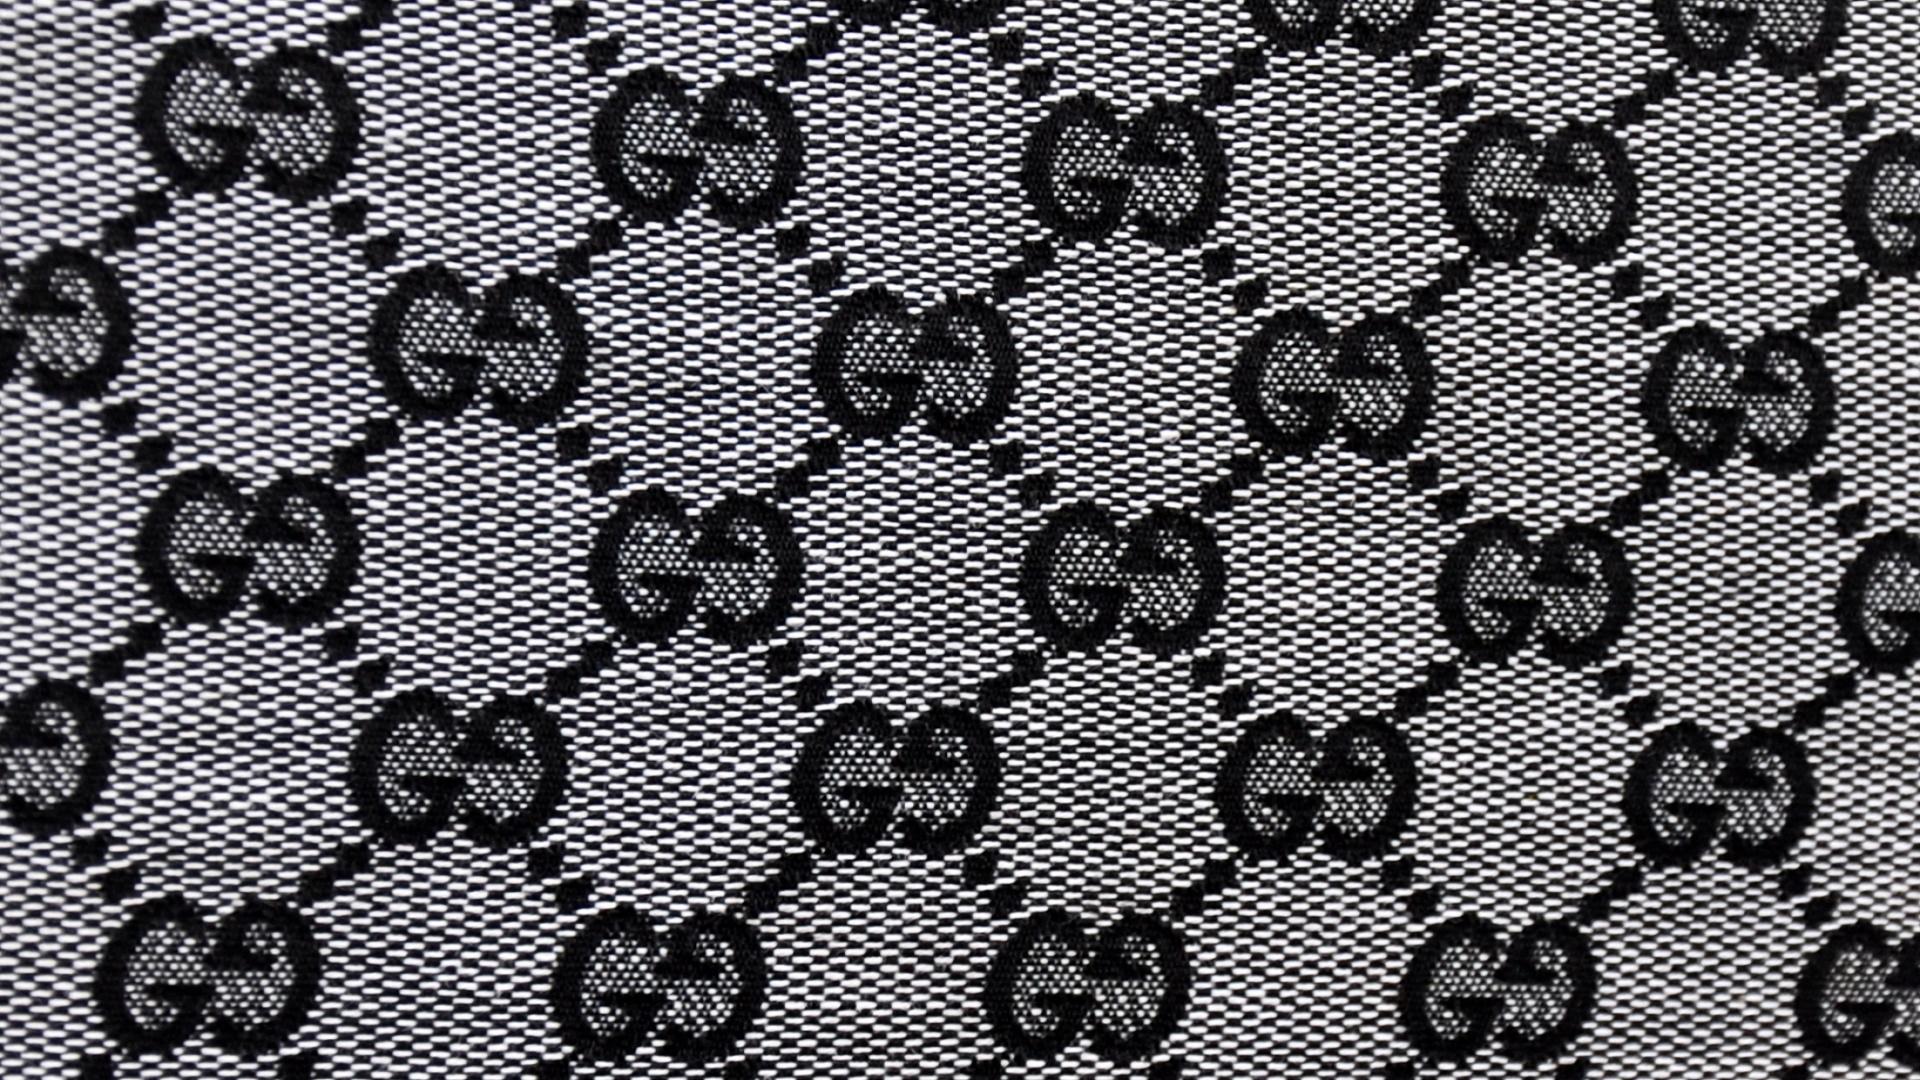 Gucci Wallpapers HD 1920x1080